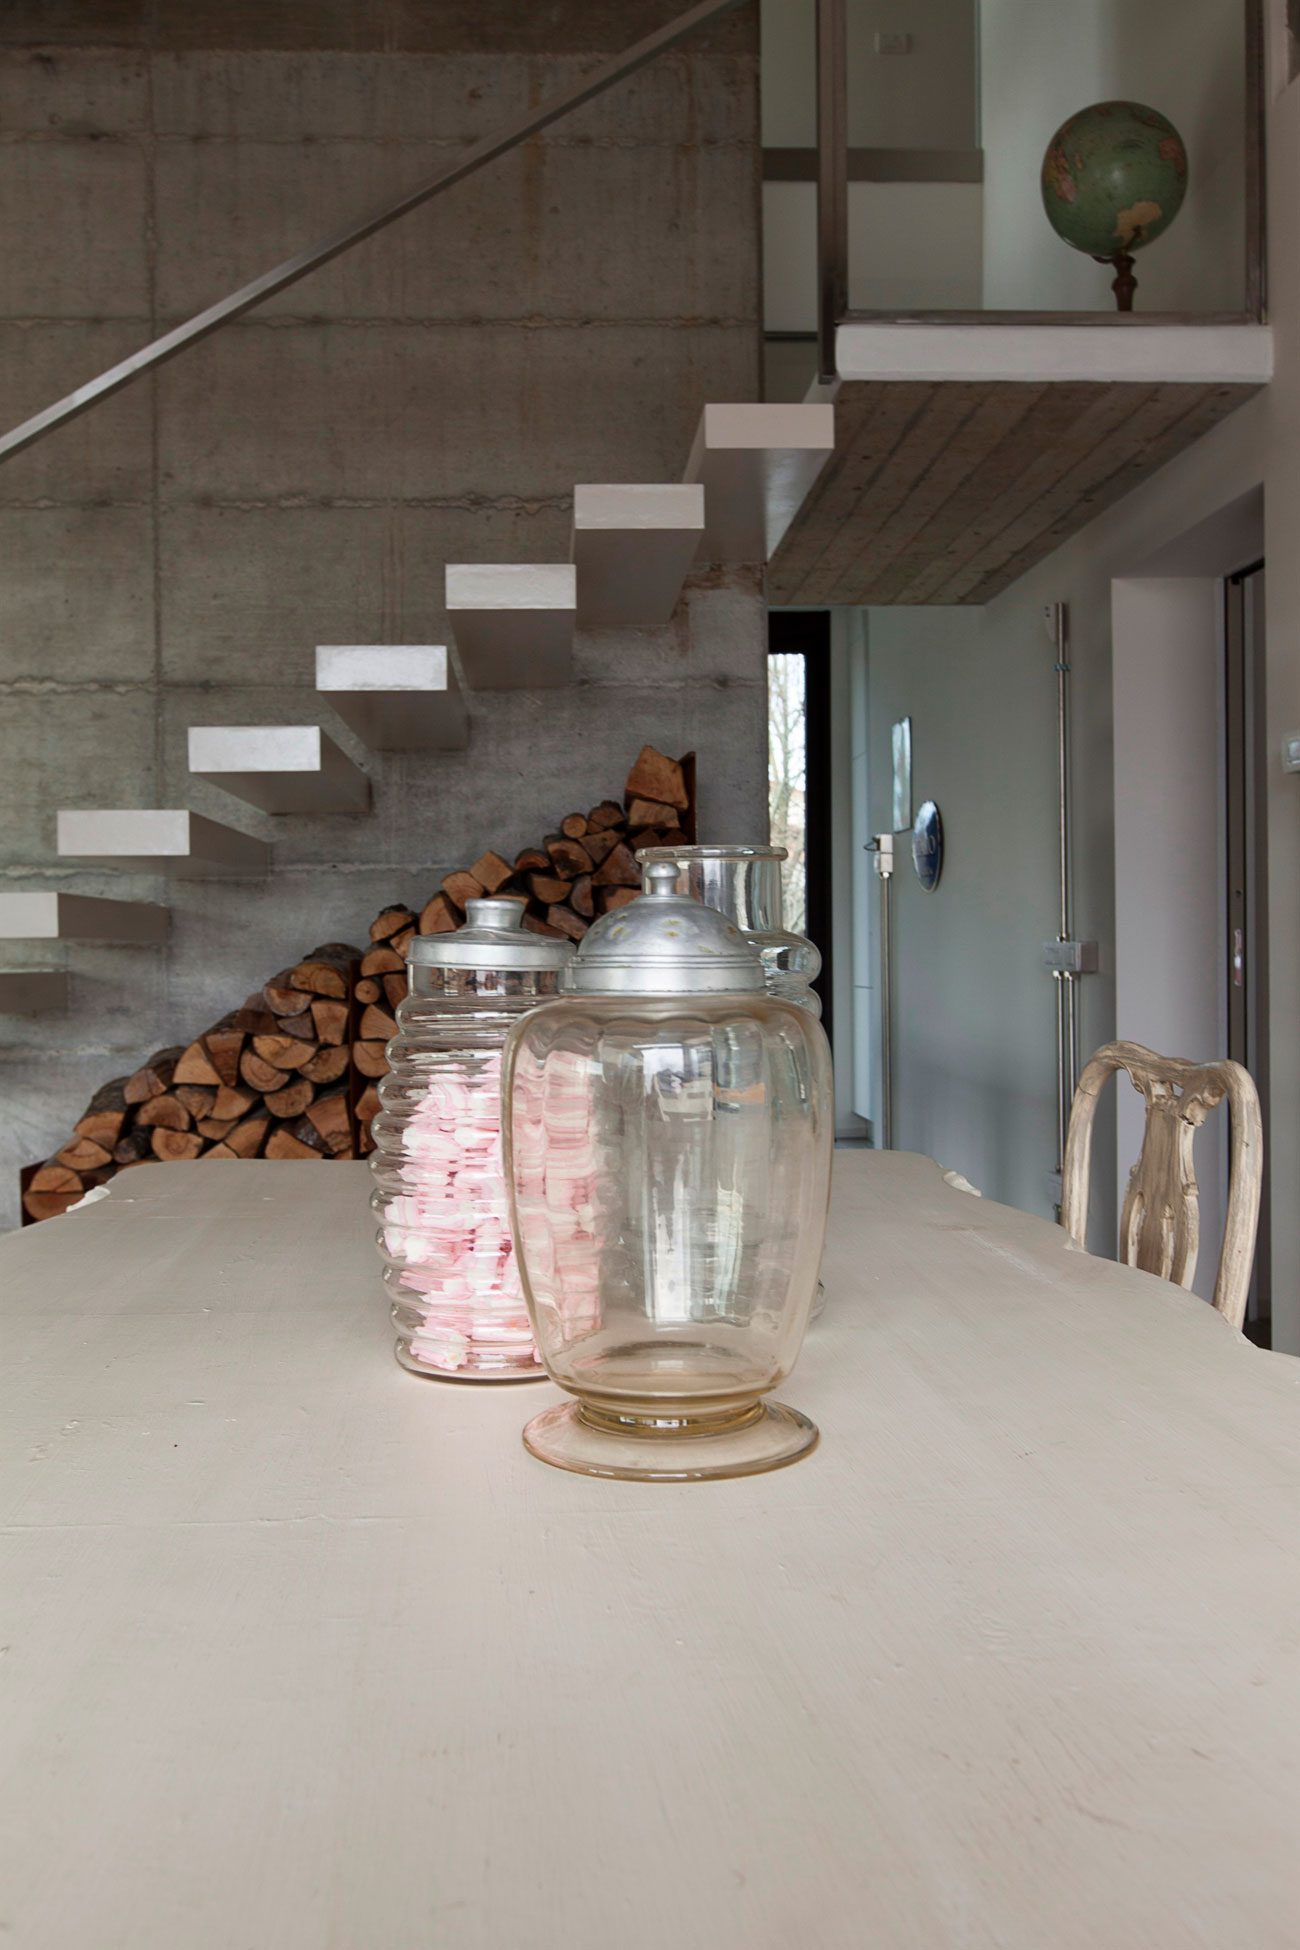 D'Autore Residence near Bologna by Giraldi Associati Architetti-27